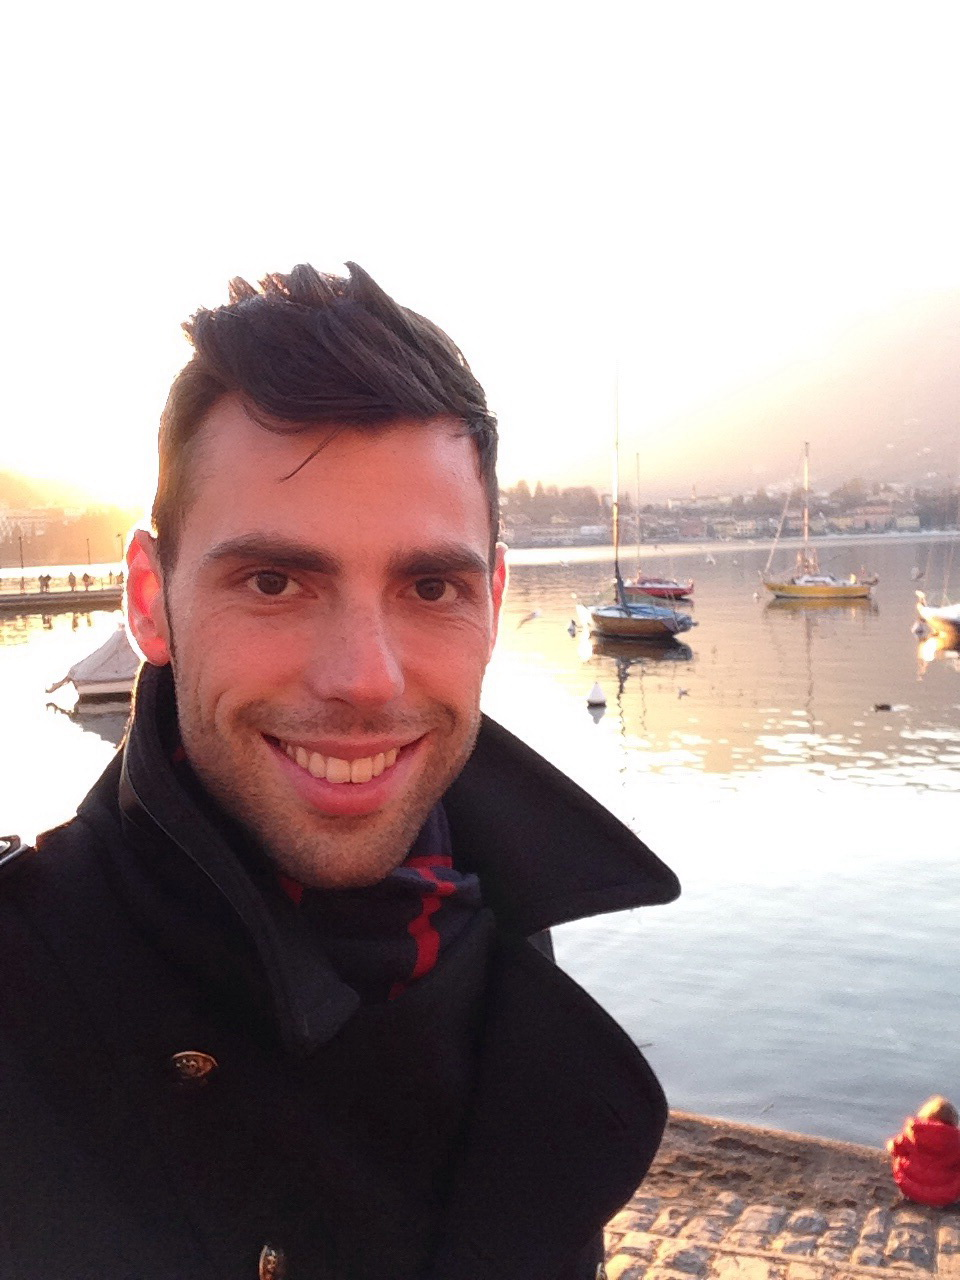 pescara gay cerco gye venezia